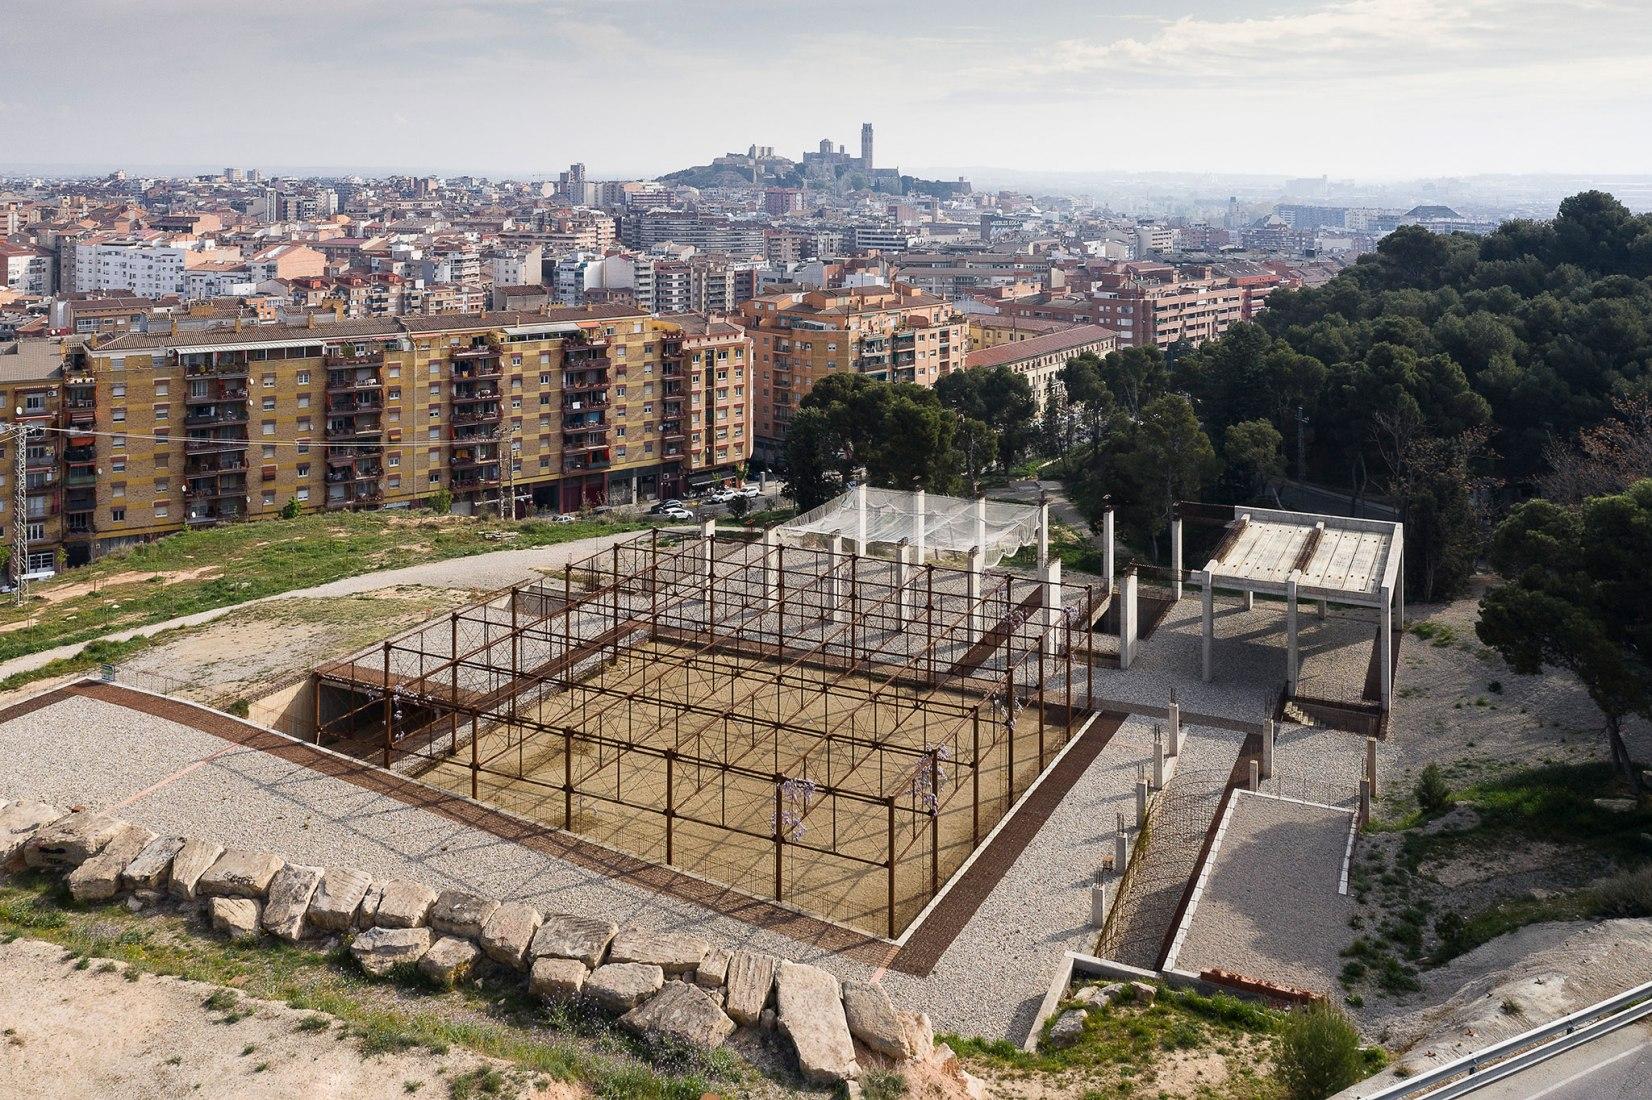 Lleida Climate Museum by Toni Gironès. Photograph by Fernando Alda.